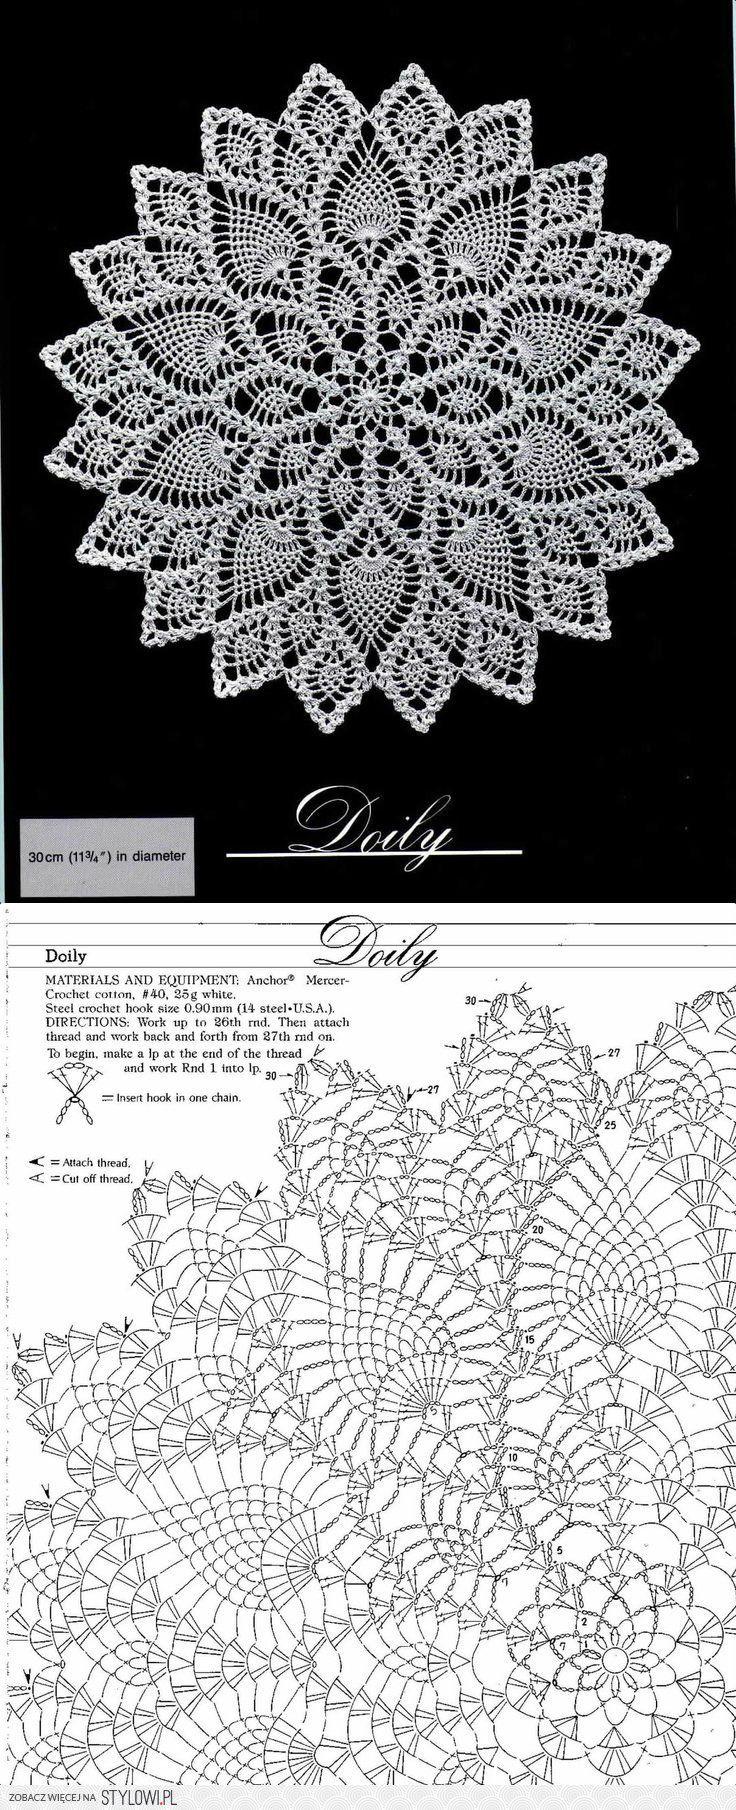 Stylowipl Odkrywaj Kolekcjonuj Kupuj Crochet Graphed Diagram Doily Patterns Doilies Free One Of The Best Diagrams Ive Done To Date